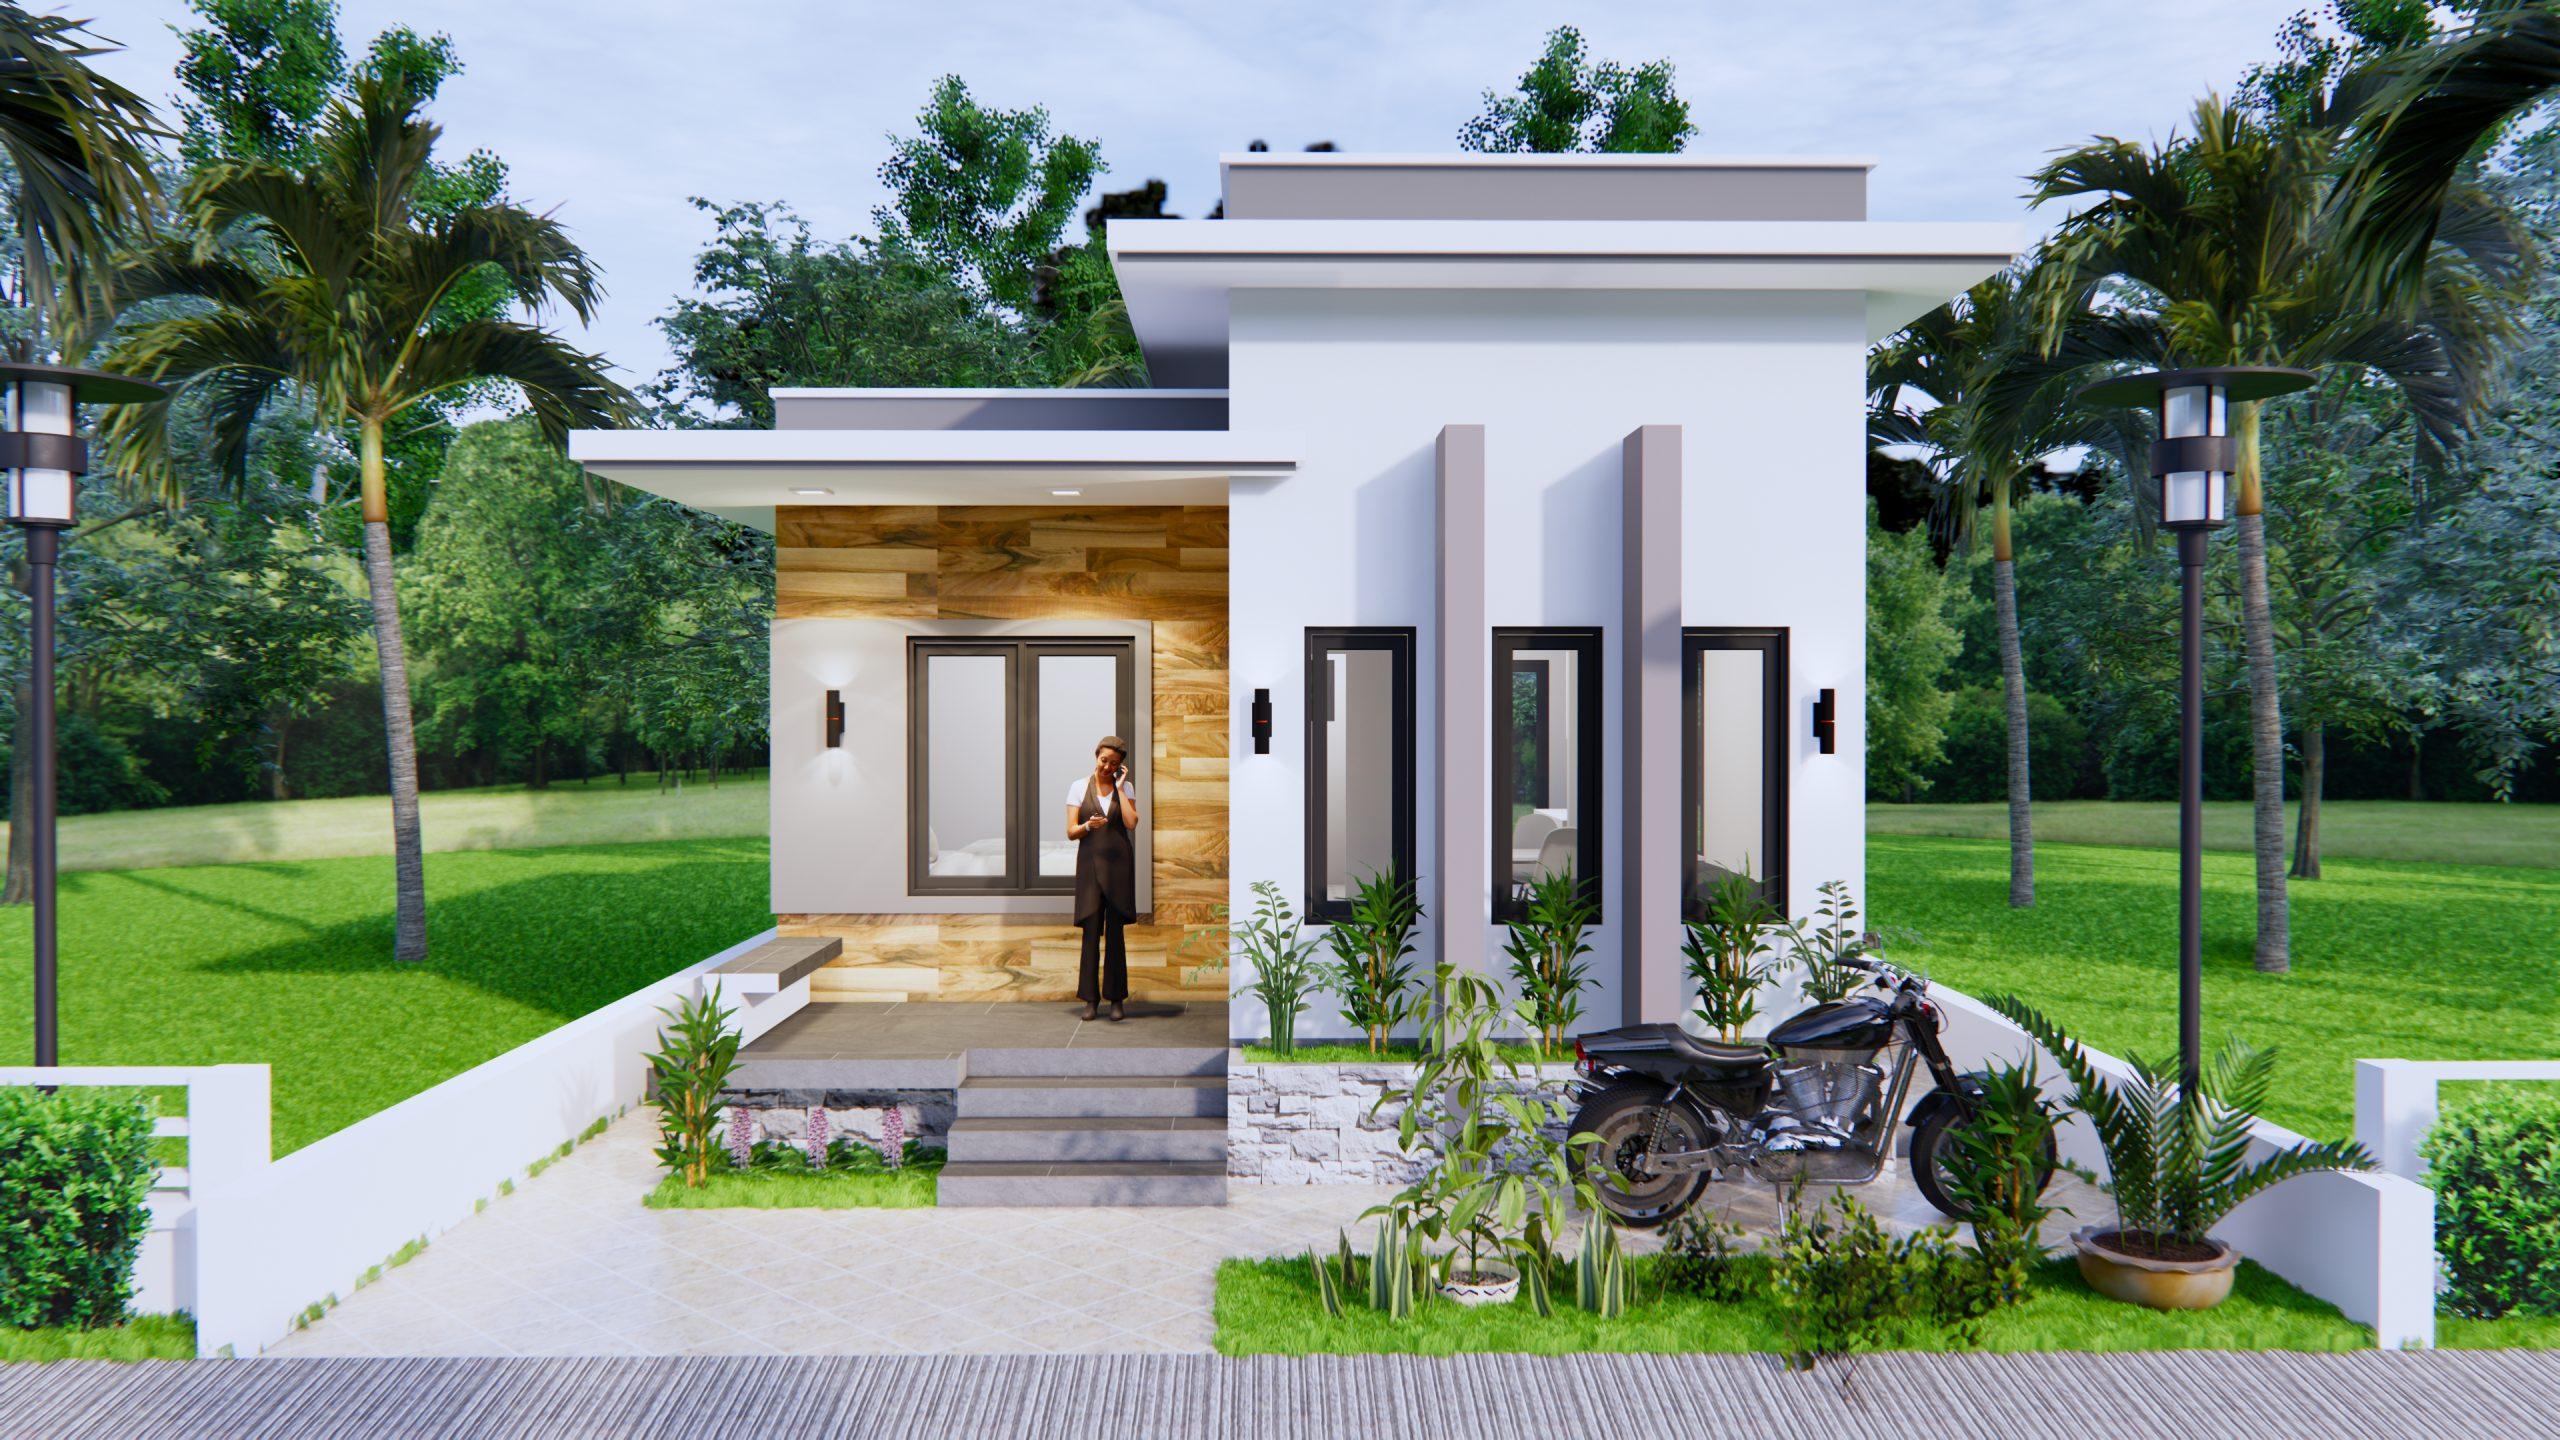 Best Small House Plans 6x8 Meter 20x27 Feet 2 Beds 1